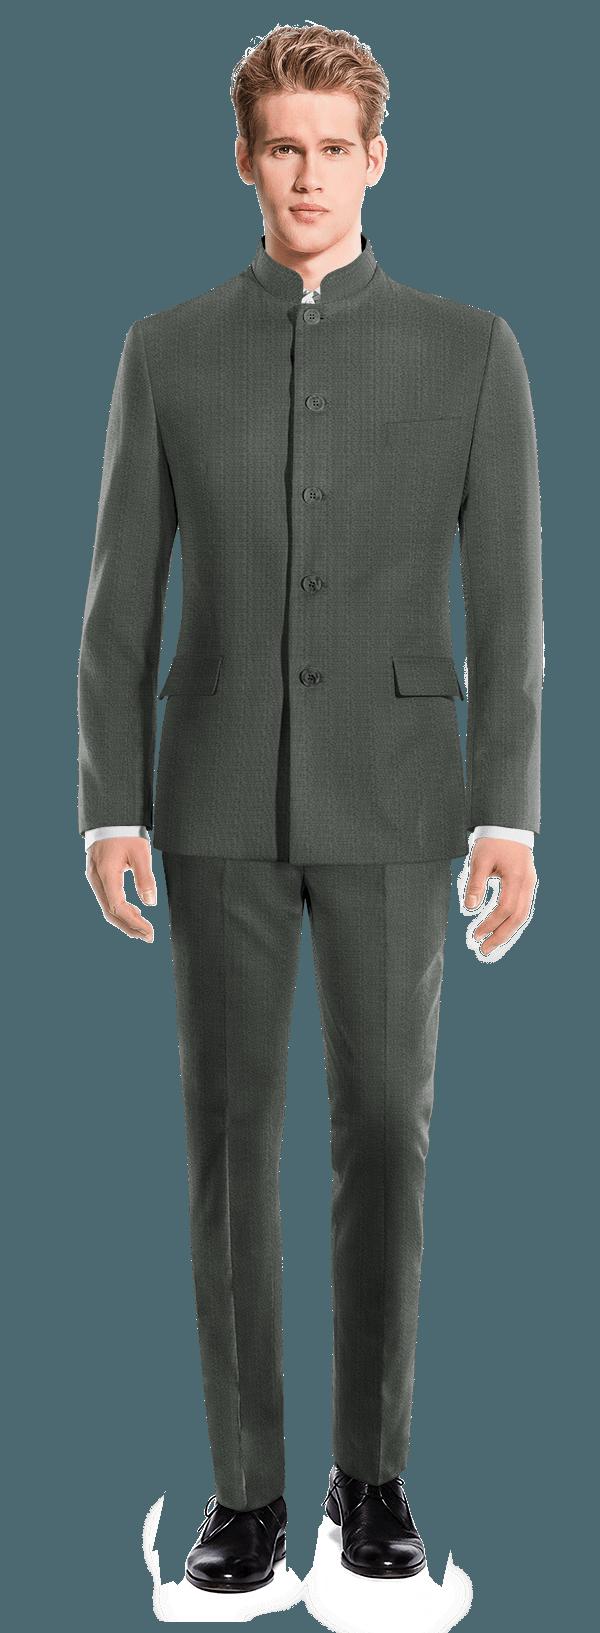 Abito Mao grigio 100% lana